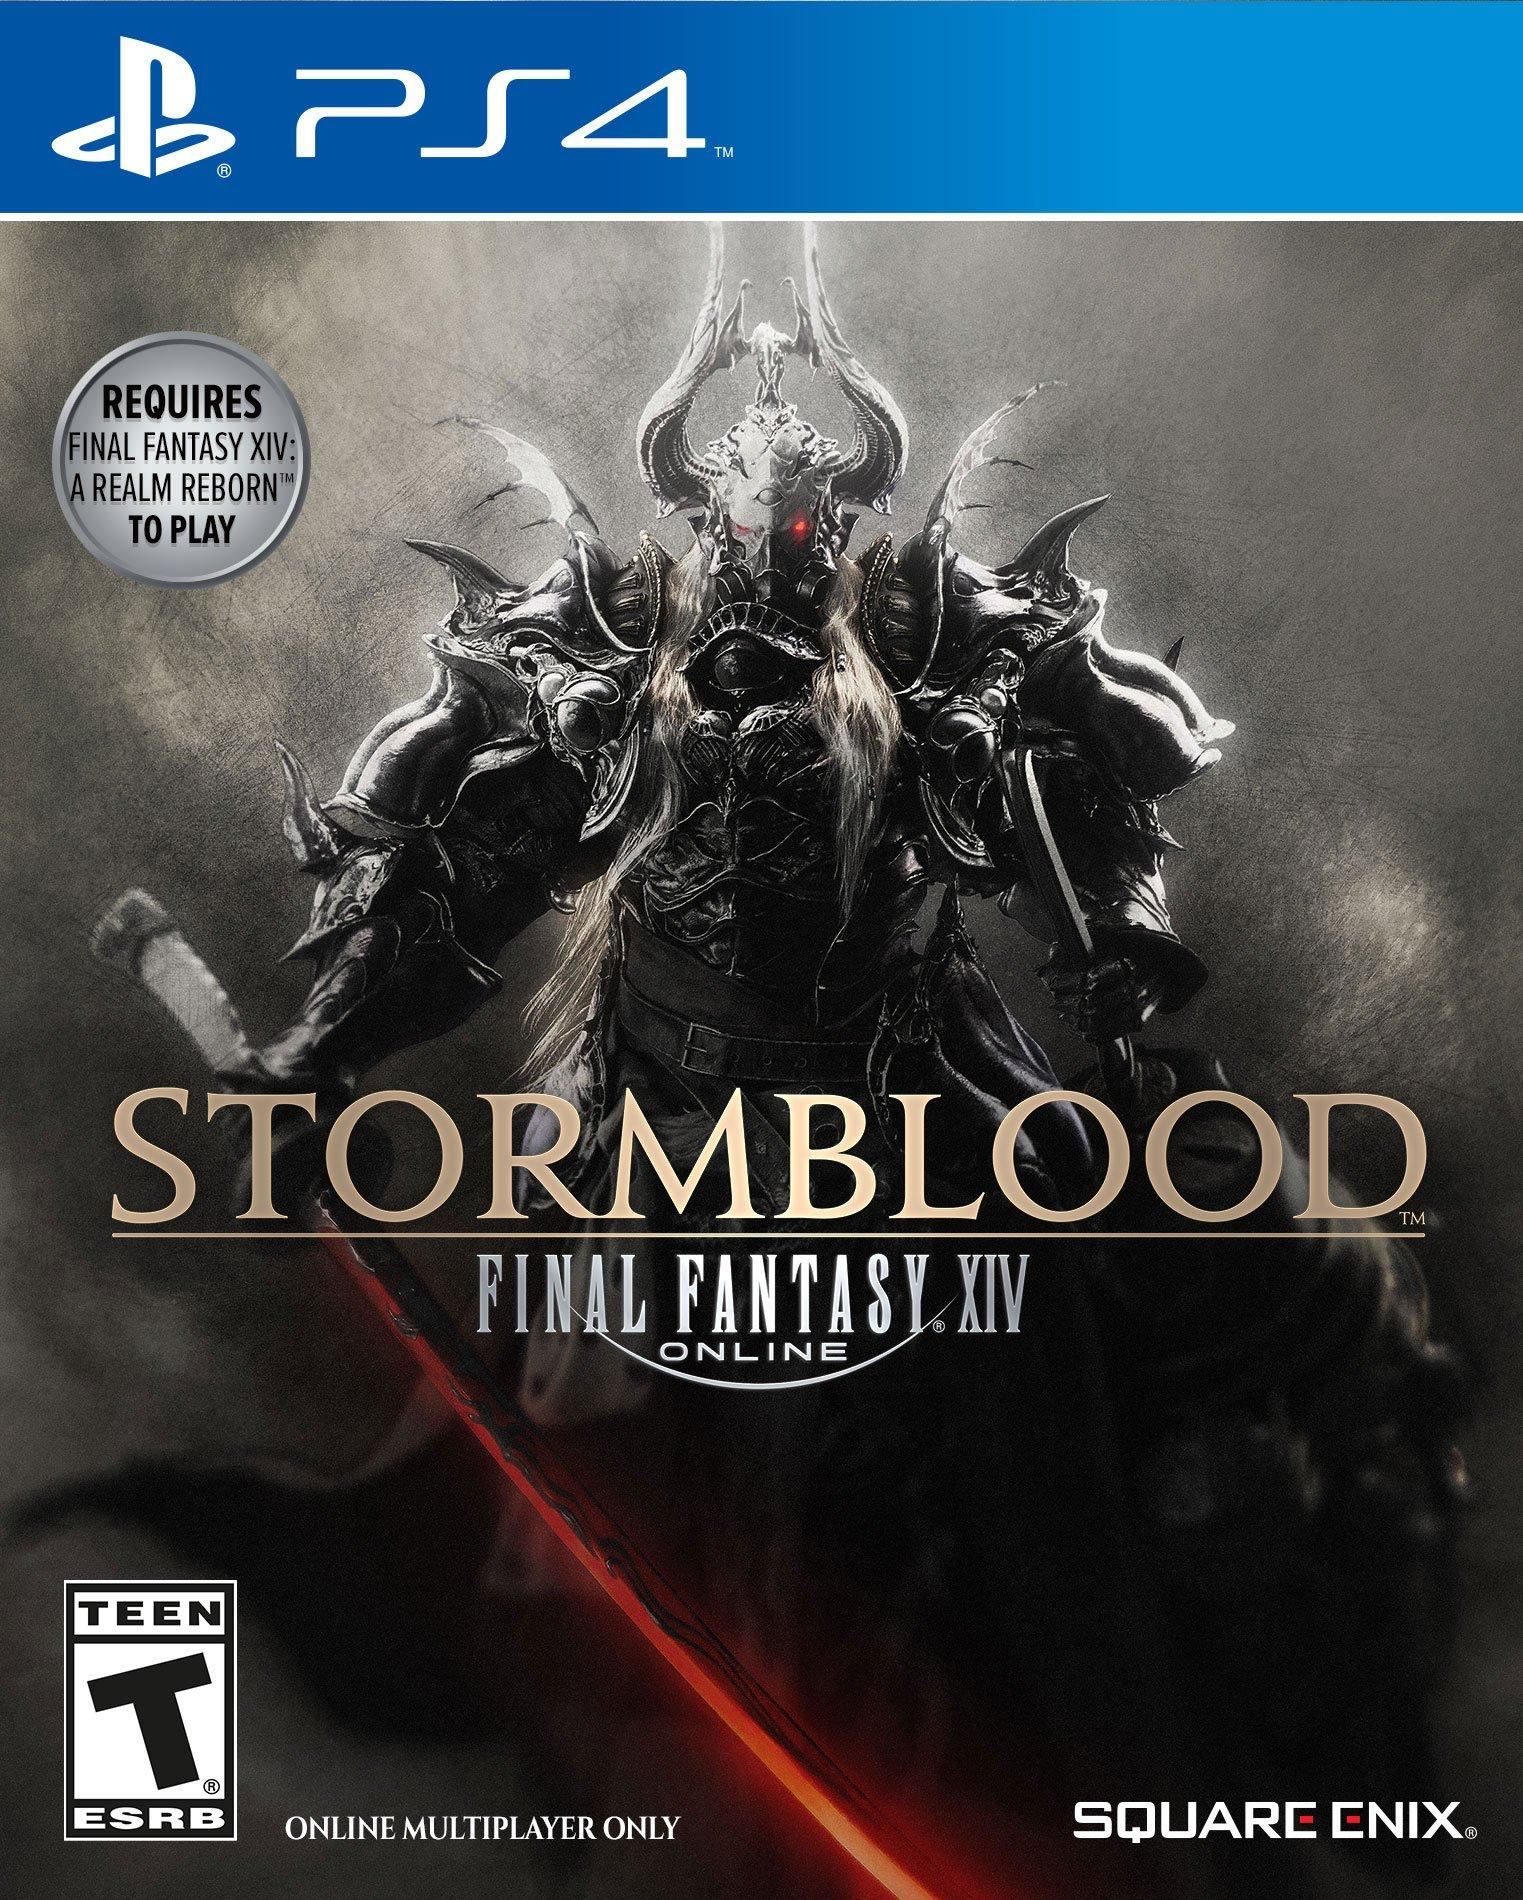 Final Fantasy XIV: Stormblood | PlayStation 4 | GameStop